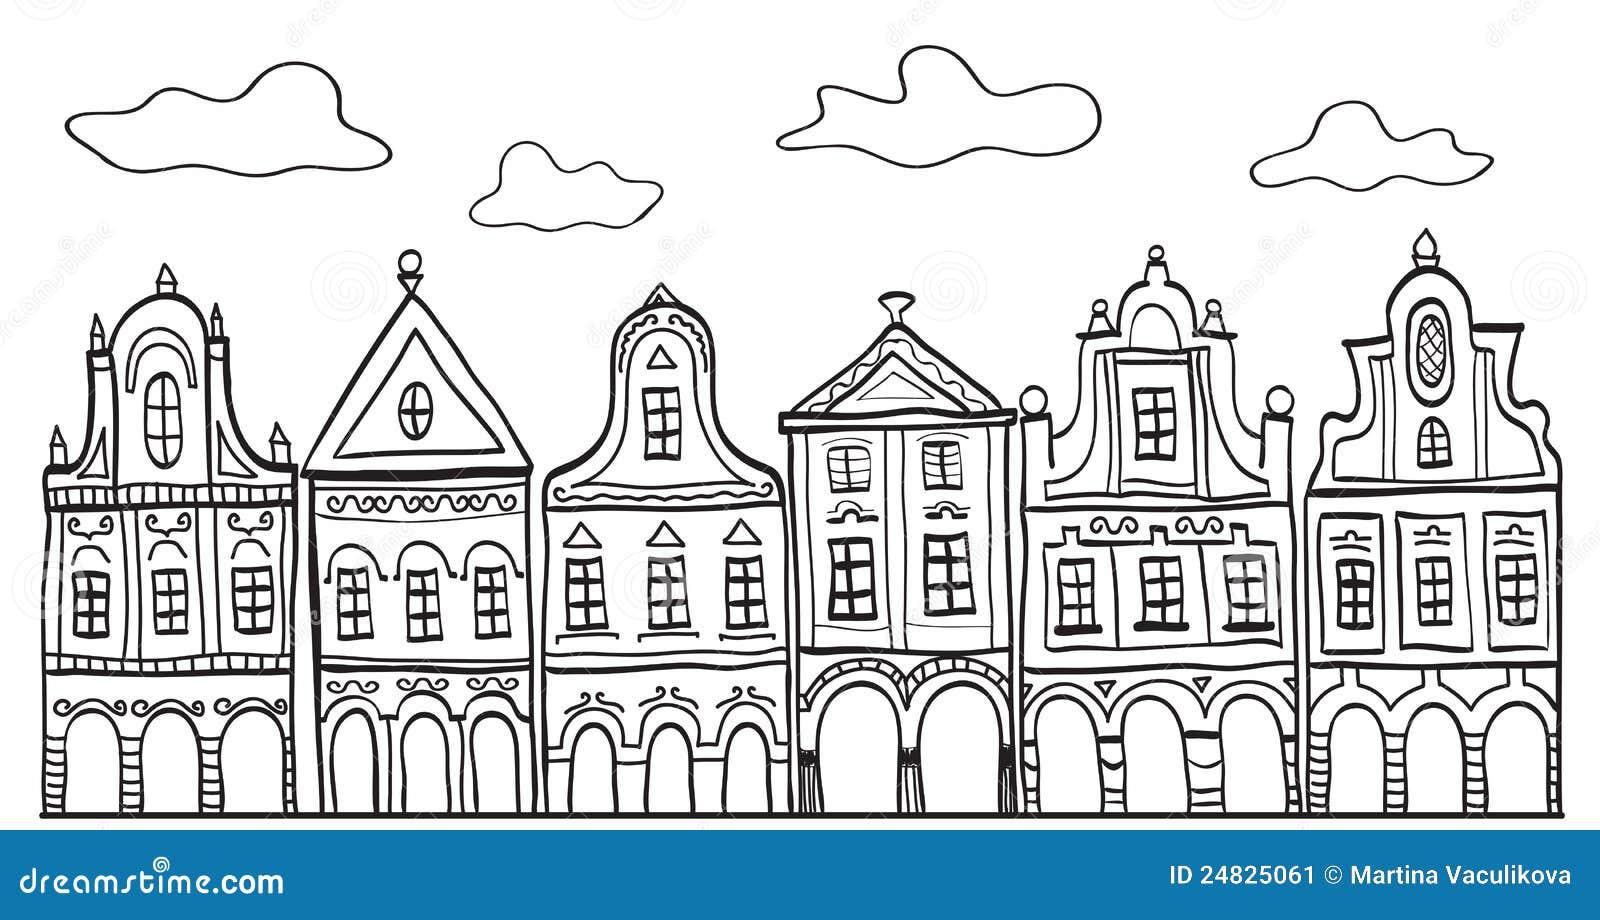 Line Art Village : Illustration of old decorated village houses stock vector